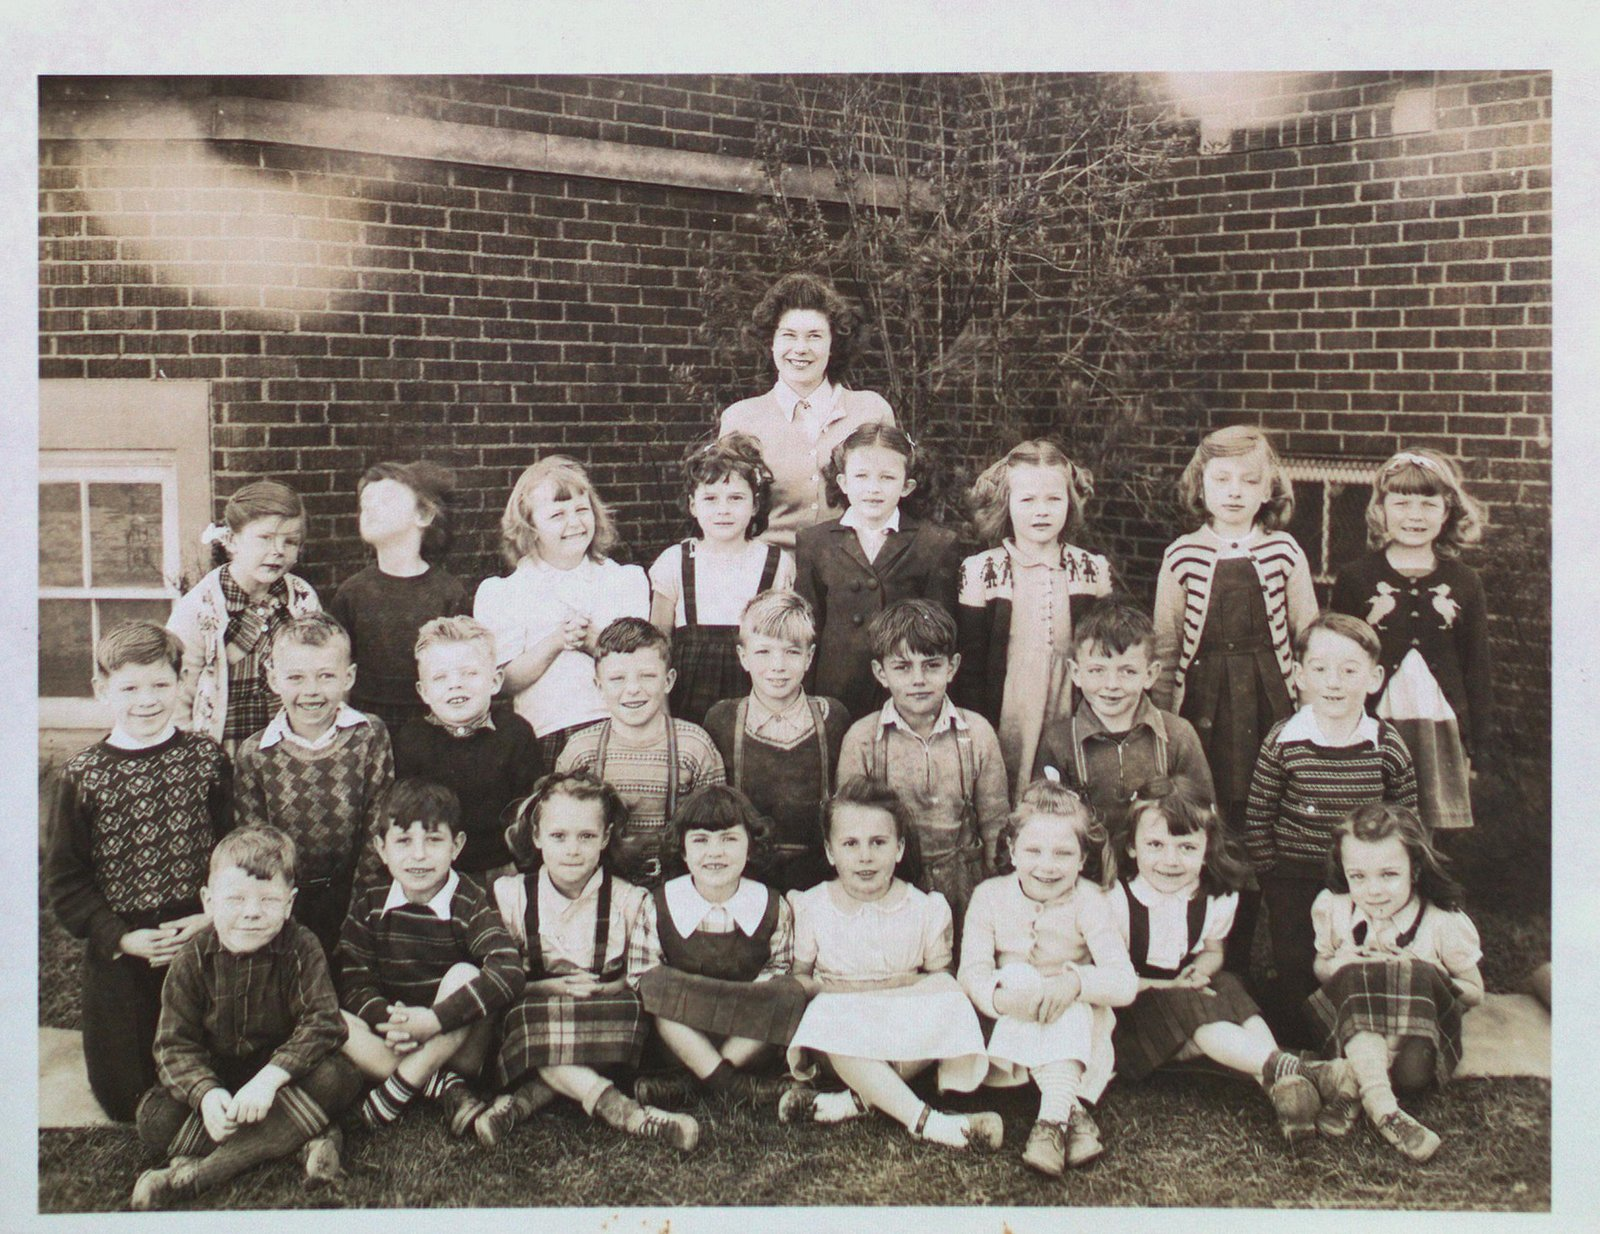 Class Portrait at Maple Crest School, Merritton